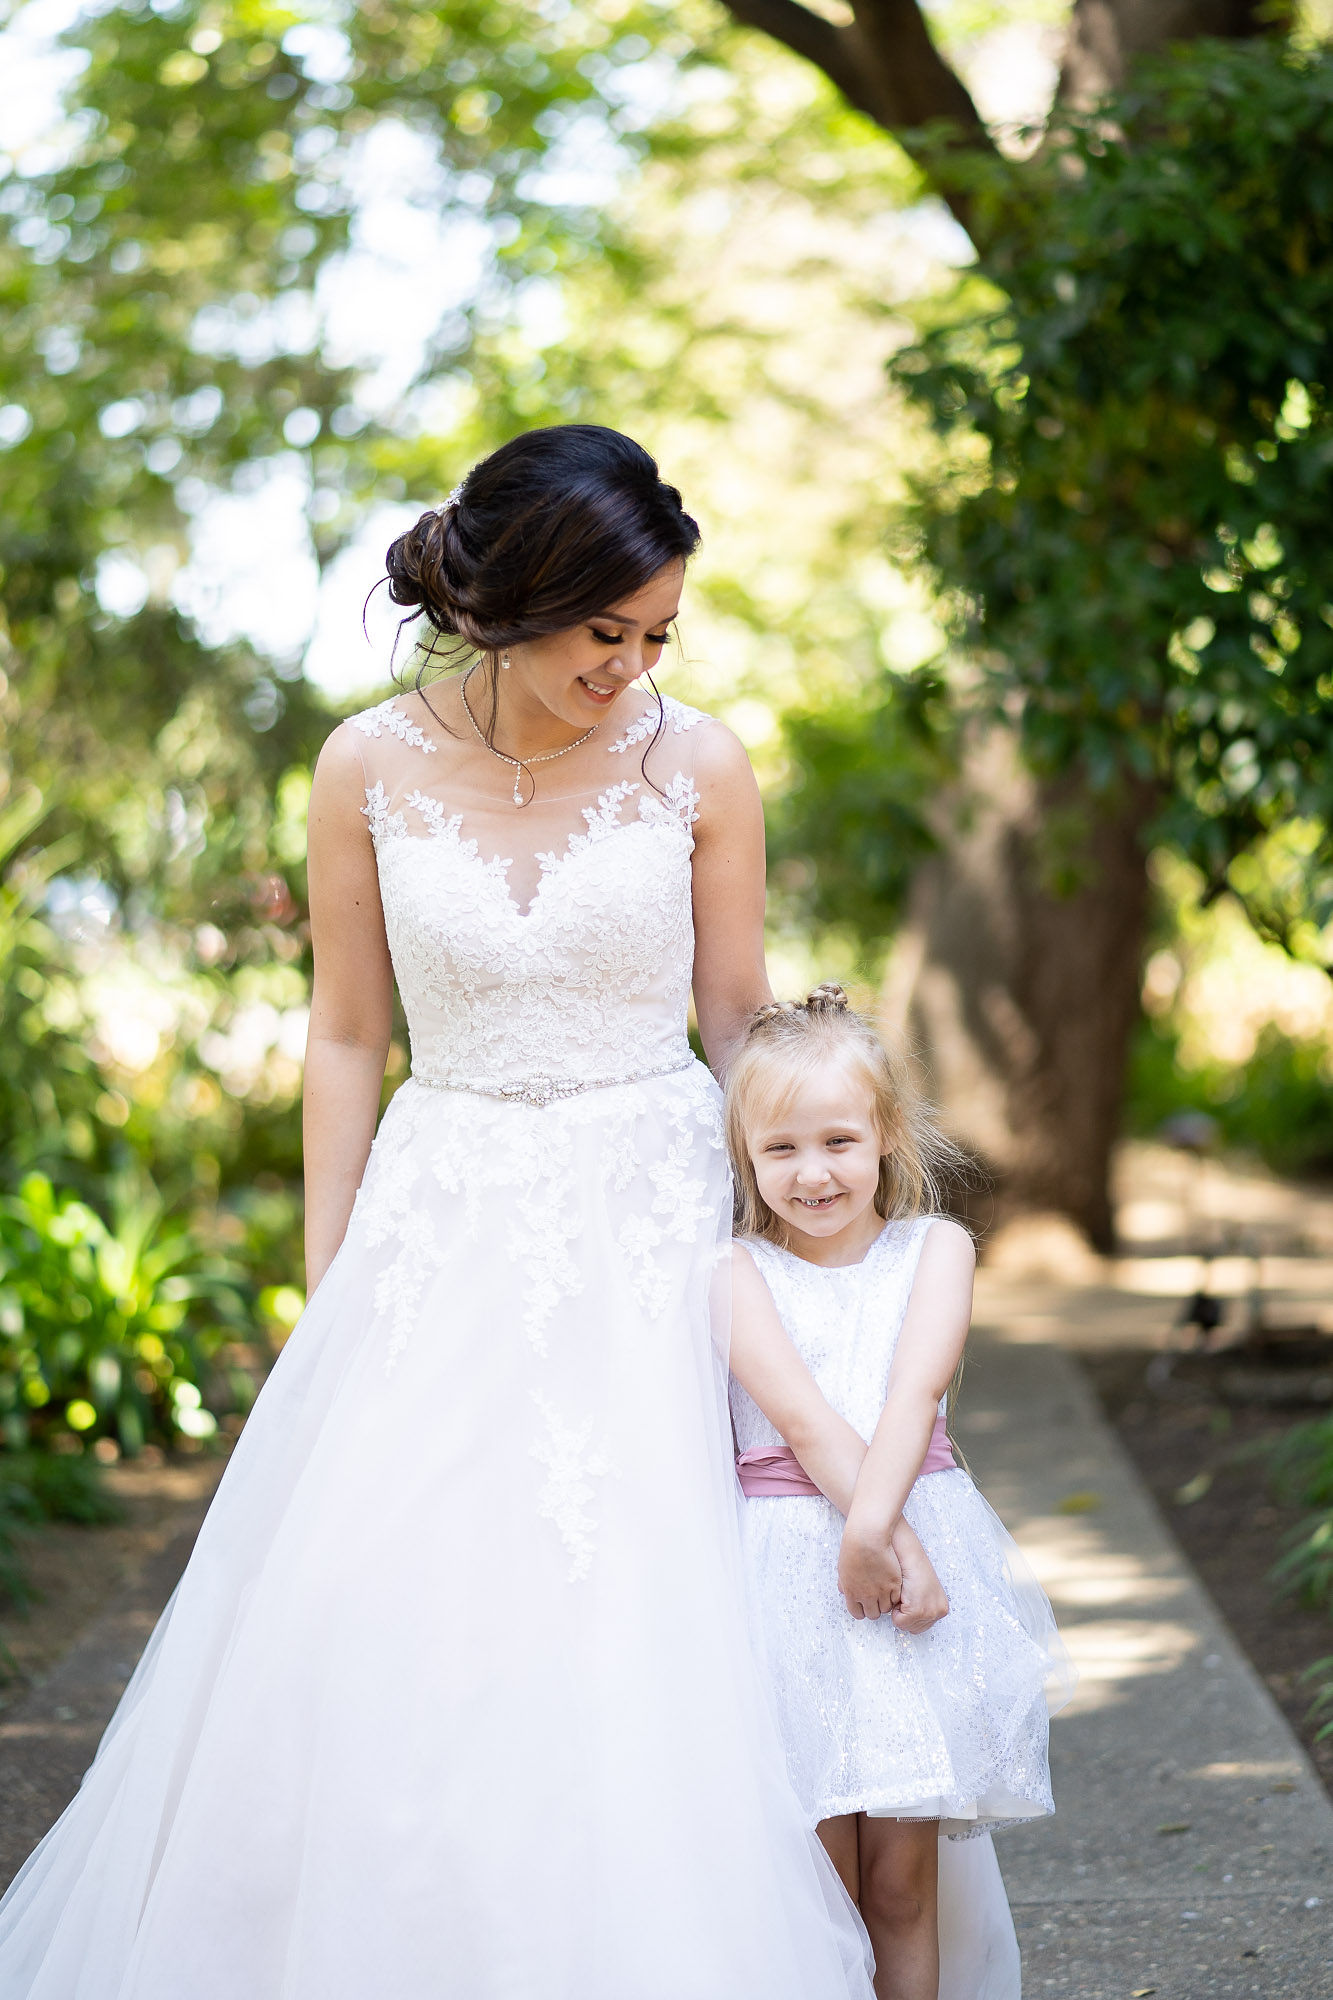 Resized-S&S-WeddingHighlights-14.jpg